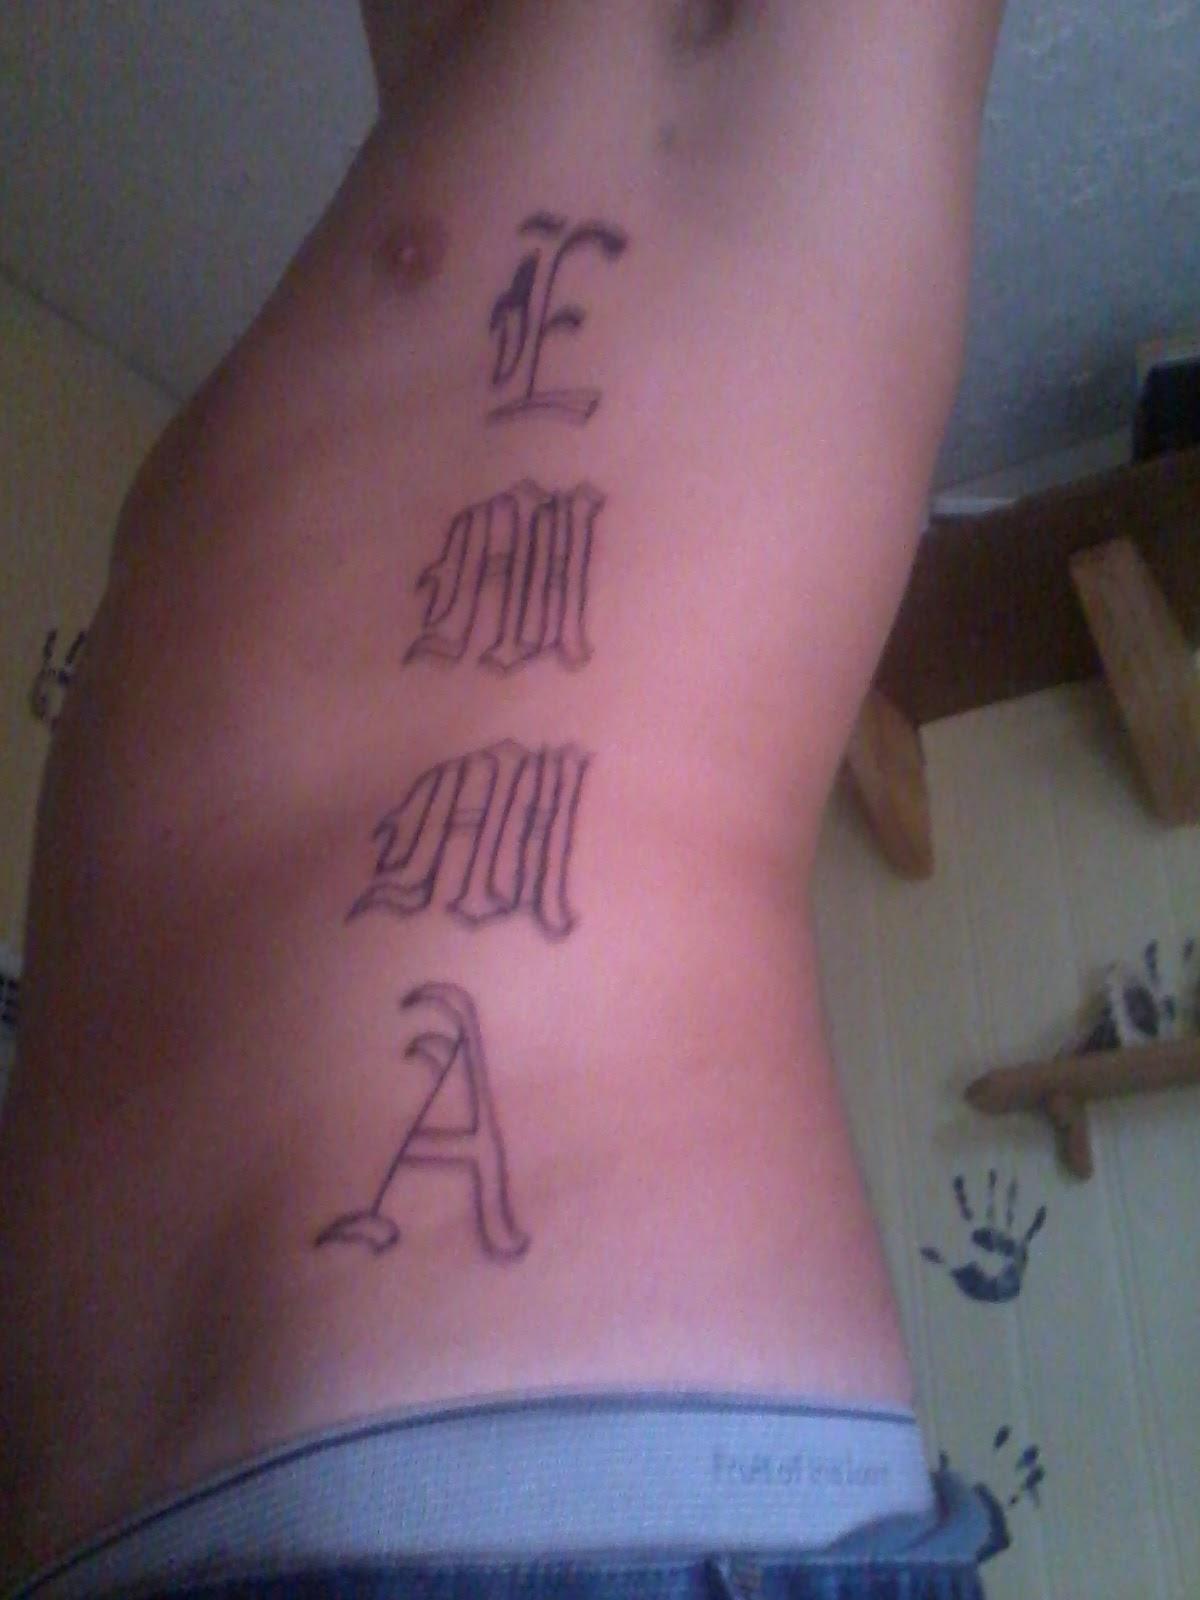 Pin pin boyfriend and girlfriend matching tattoos tumblr for Bf gf matching tattoos